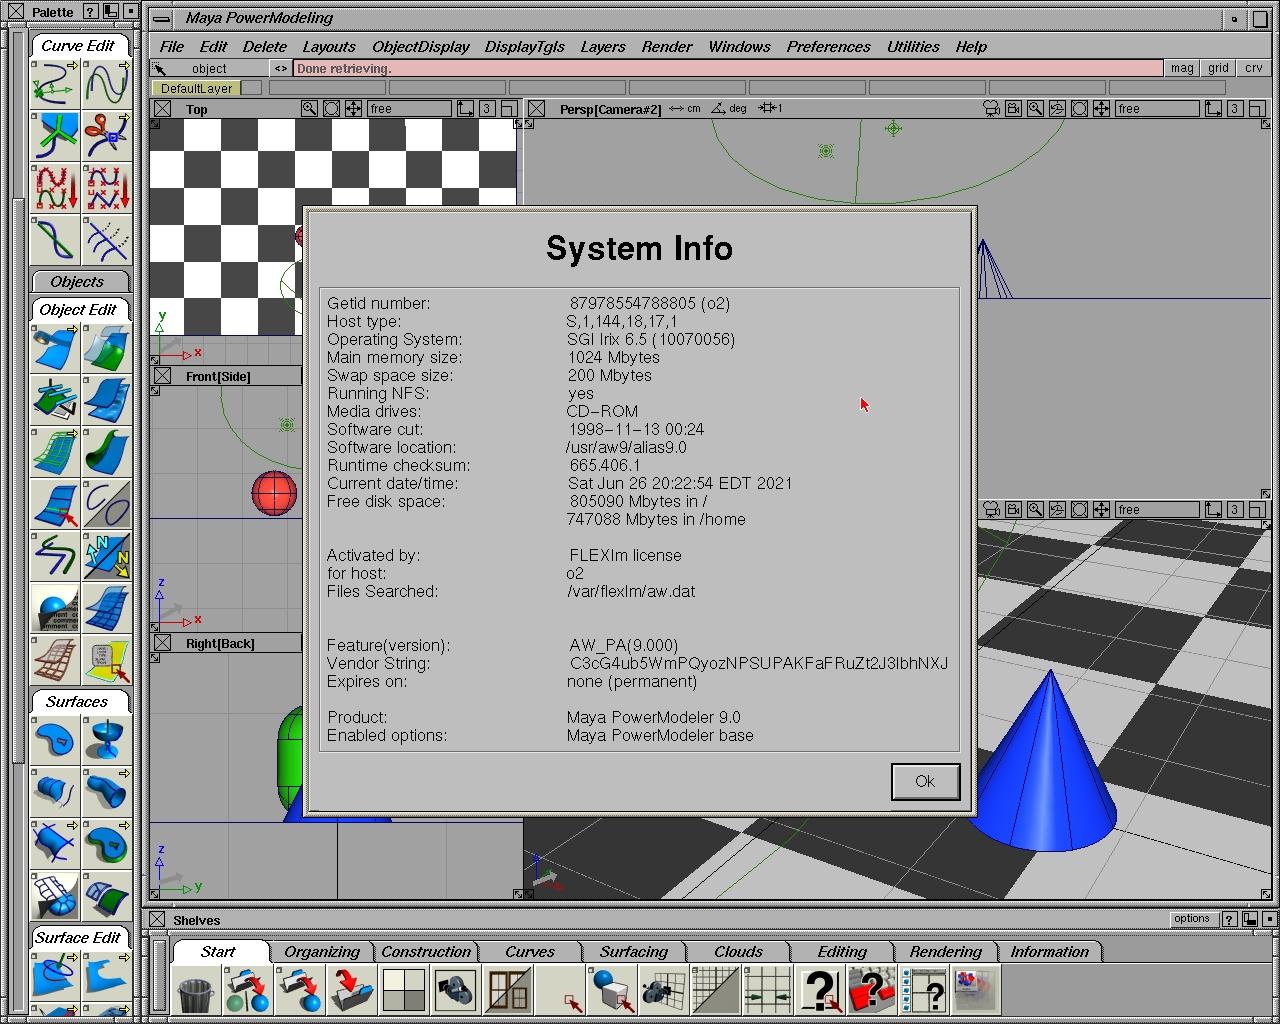 Maya_PowerModeler9.0.jpg